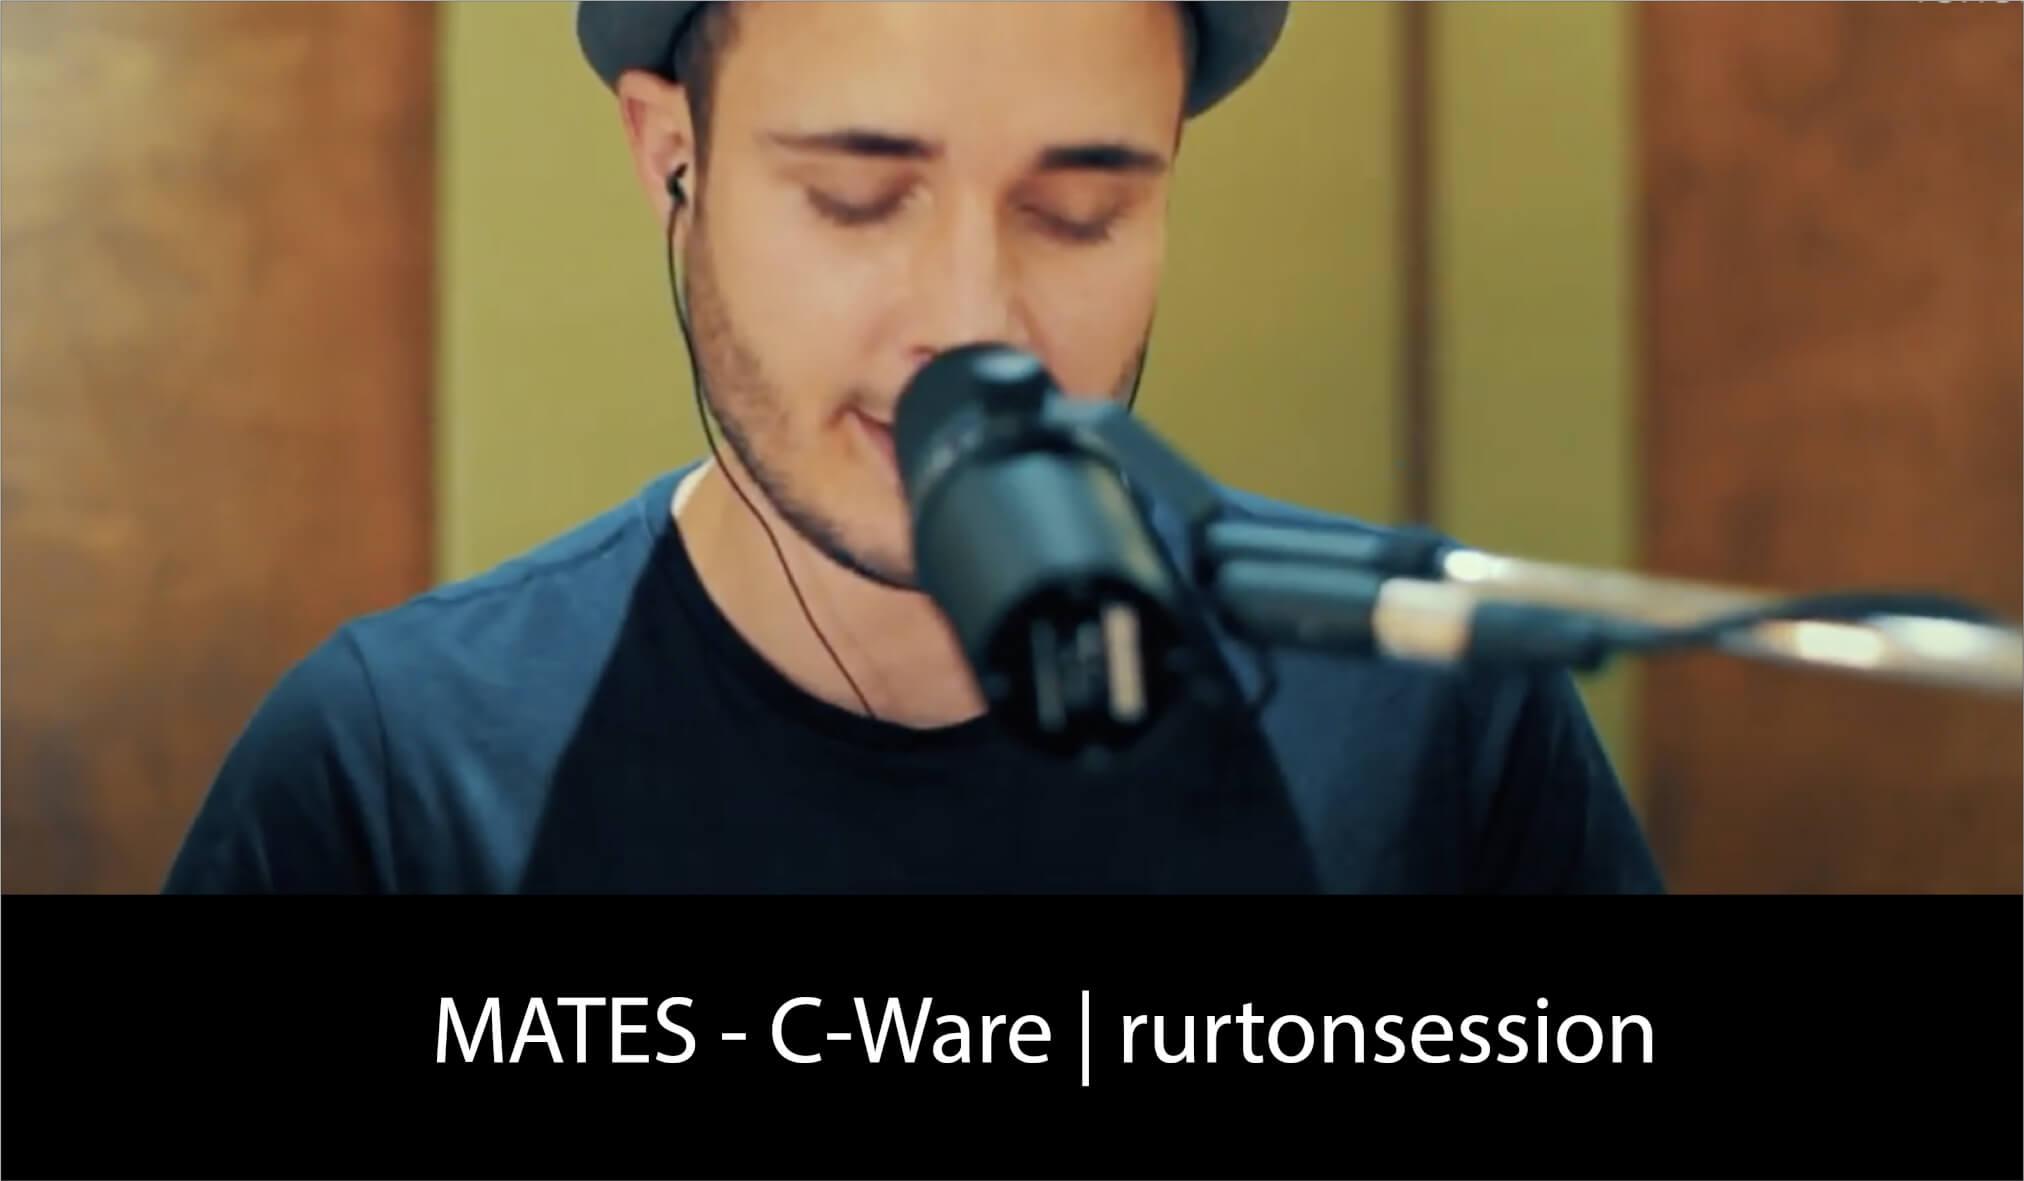 MATES - C-WARE rurtonsession